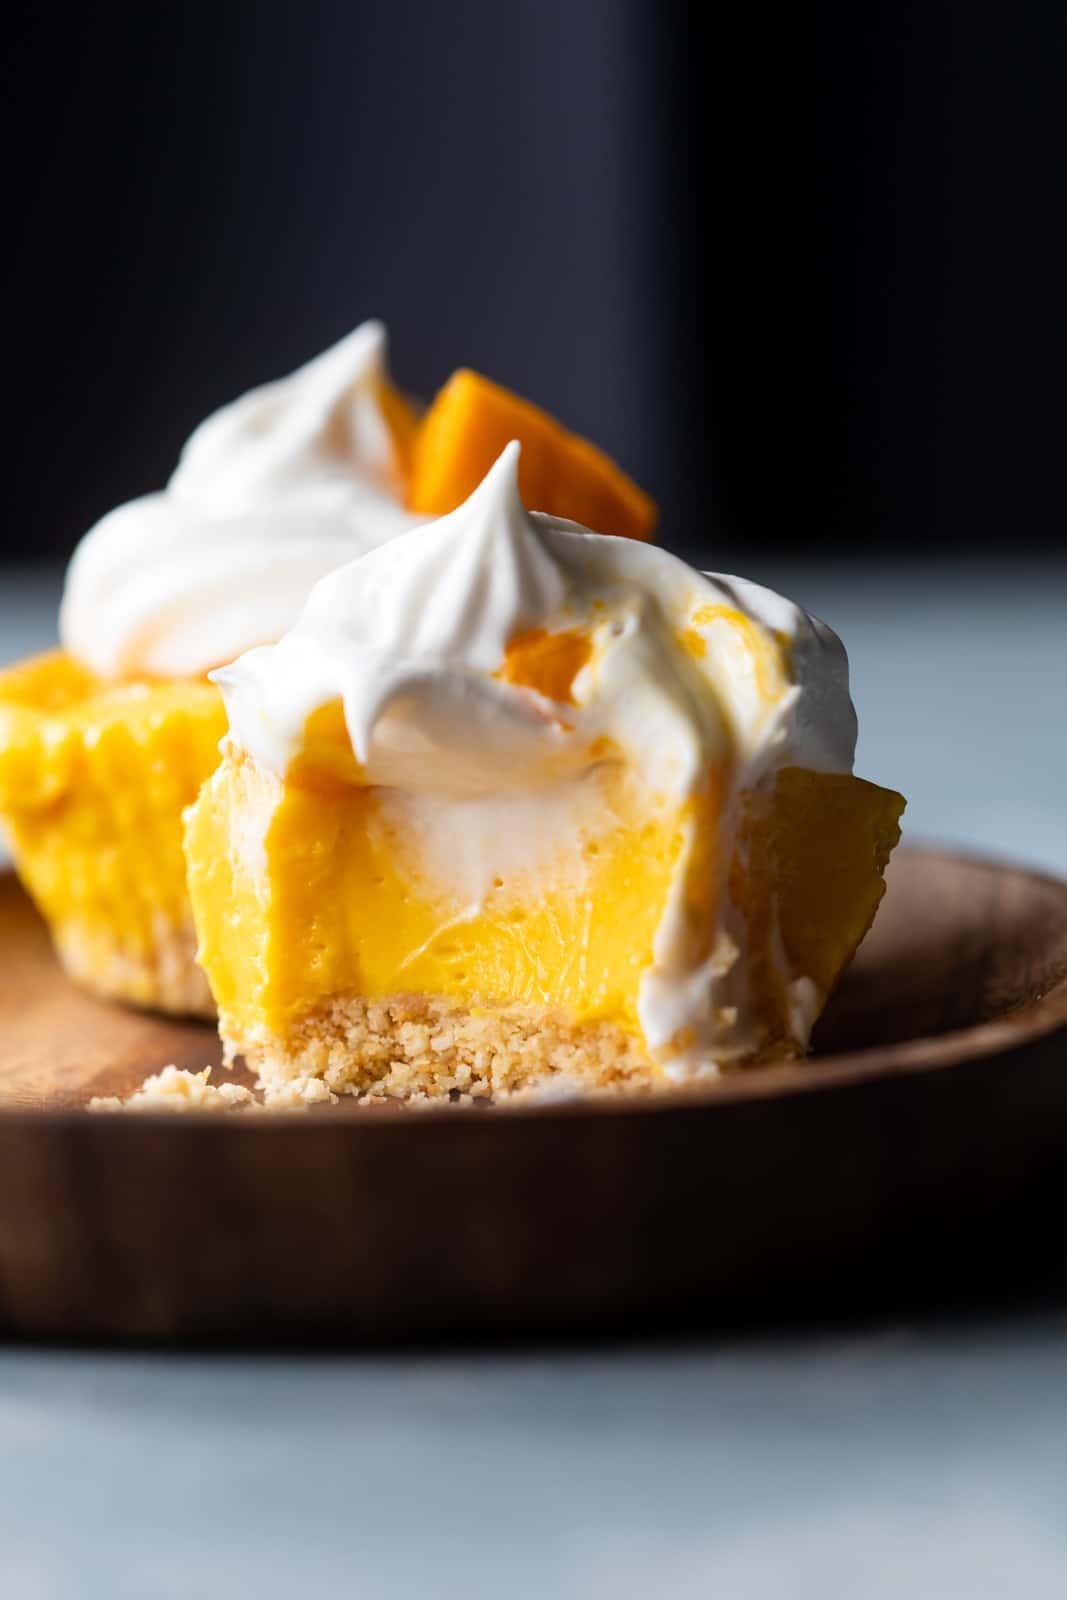 Closeup of a bite takes out of mini mango cheesecakes to show texture